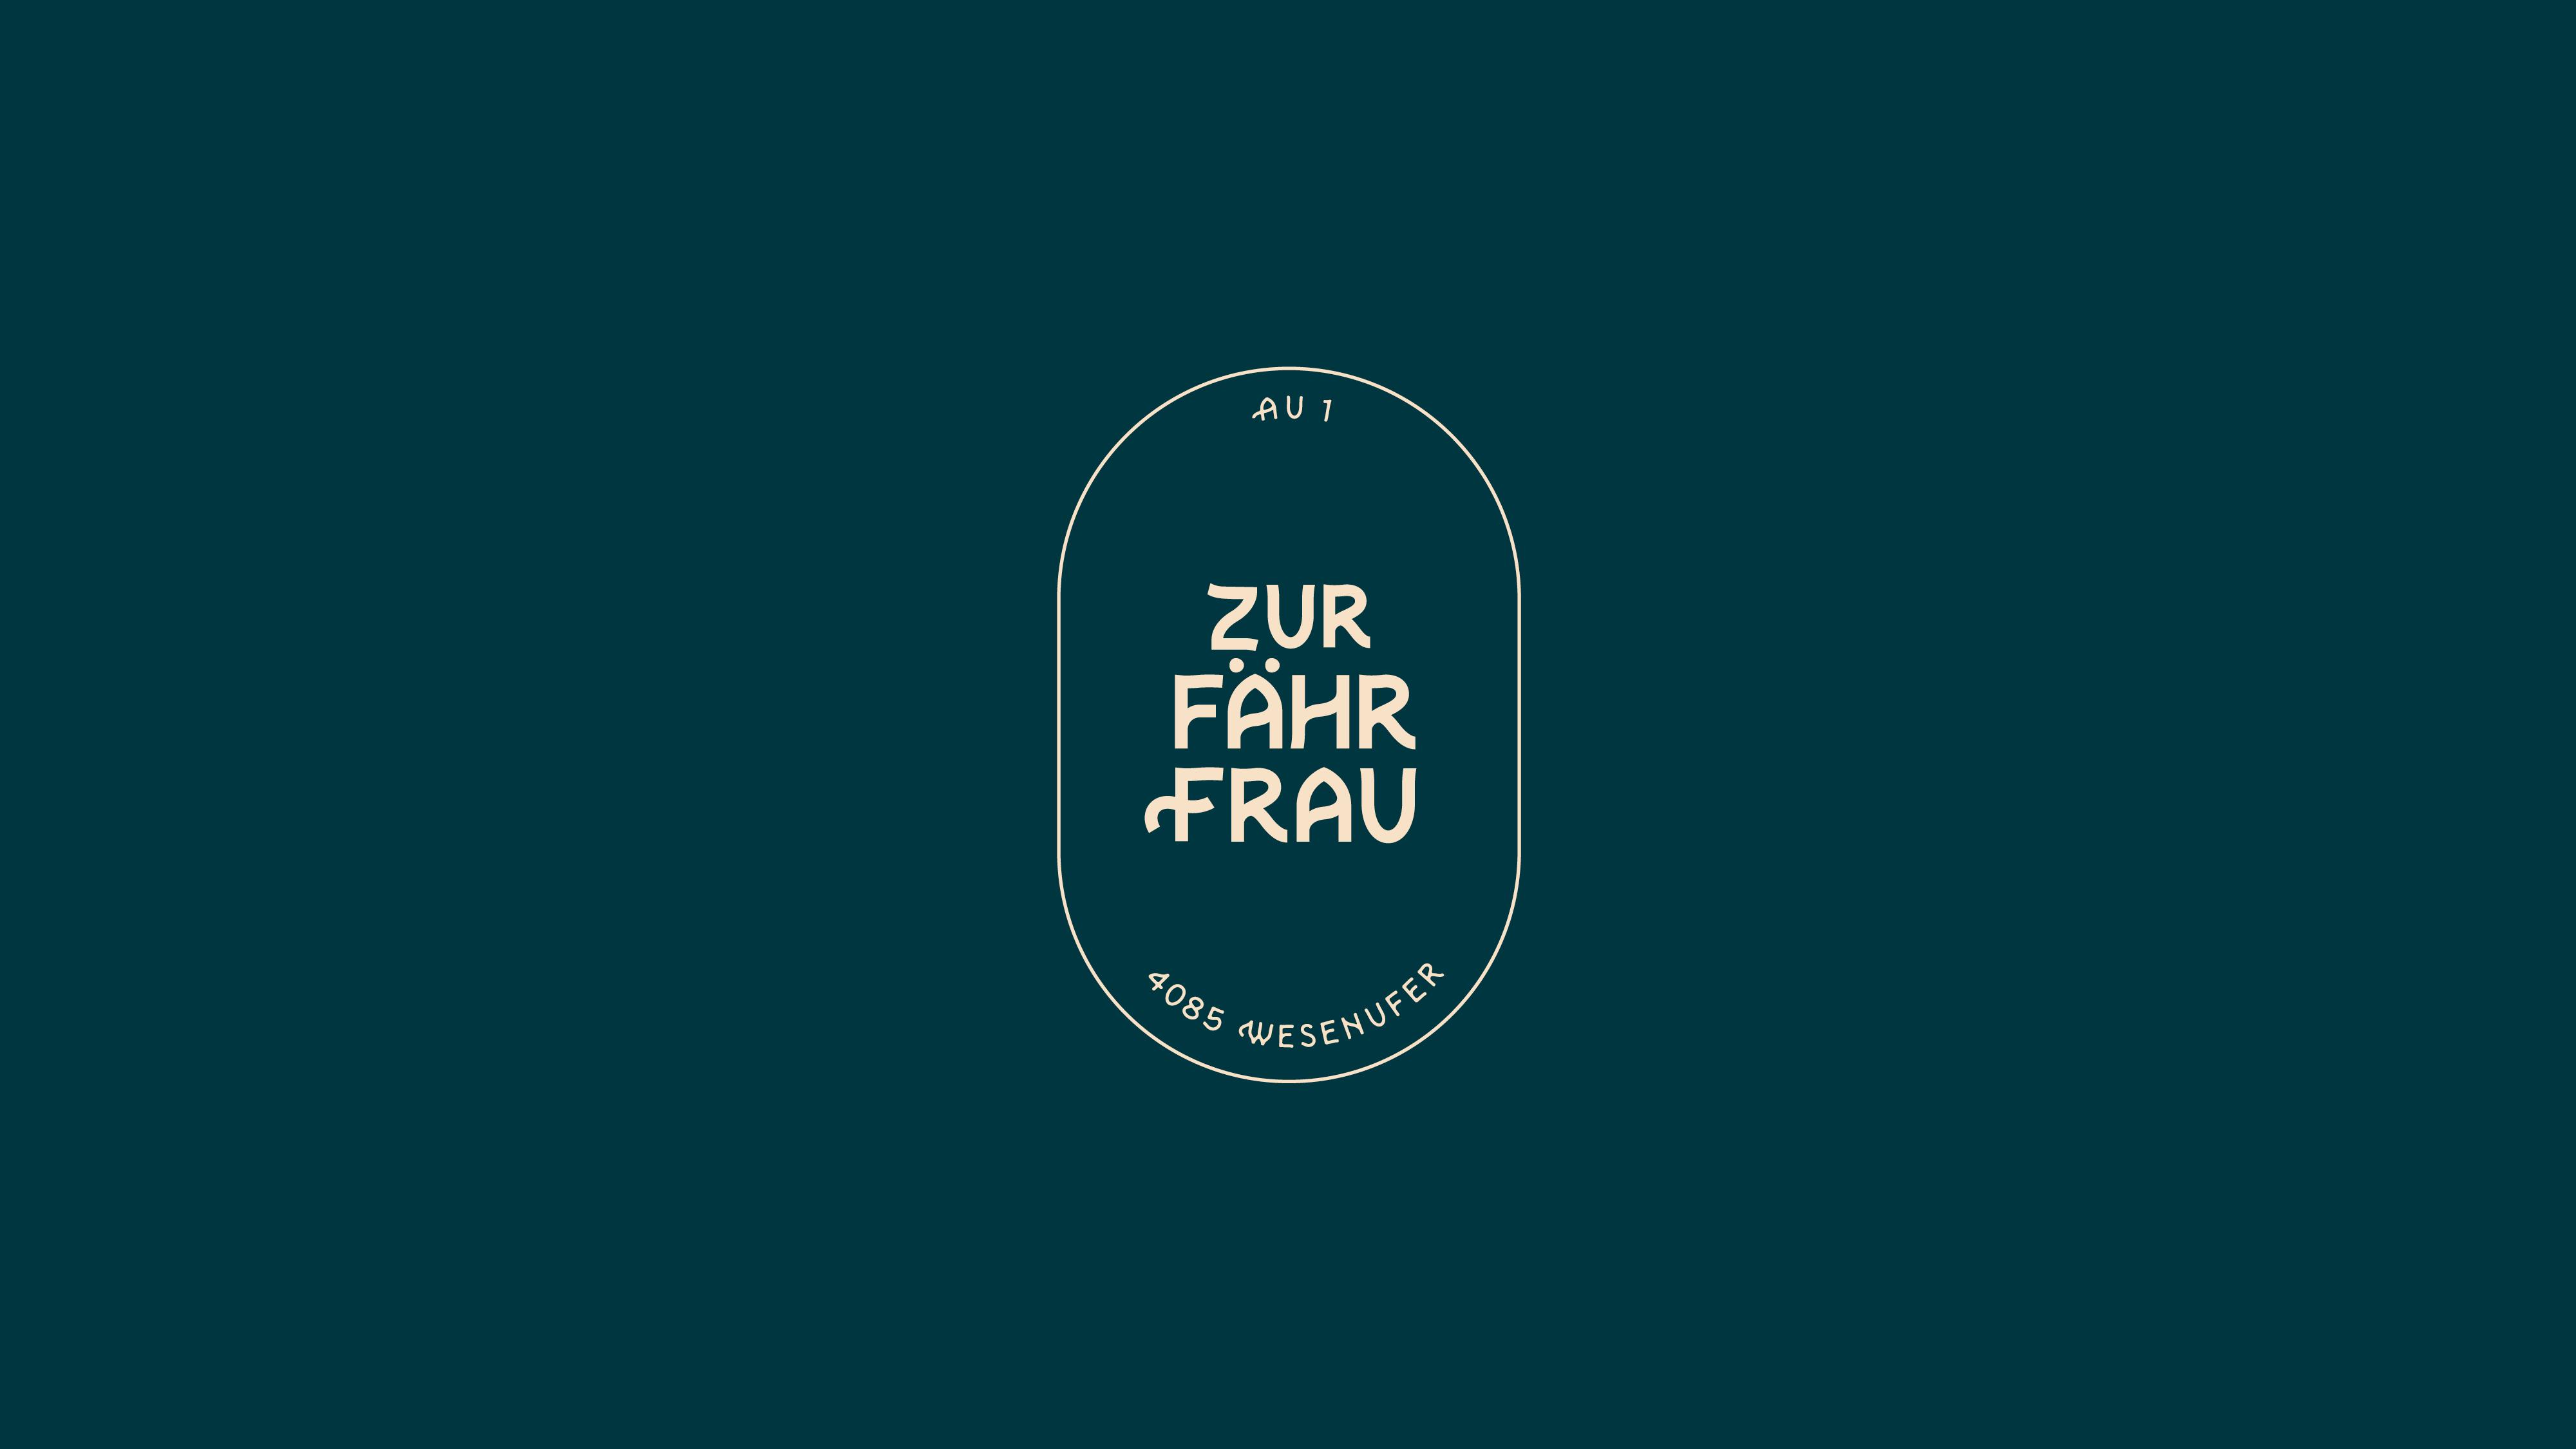 Ref Faehrfrau Website 1 LOGO